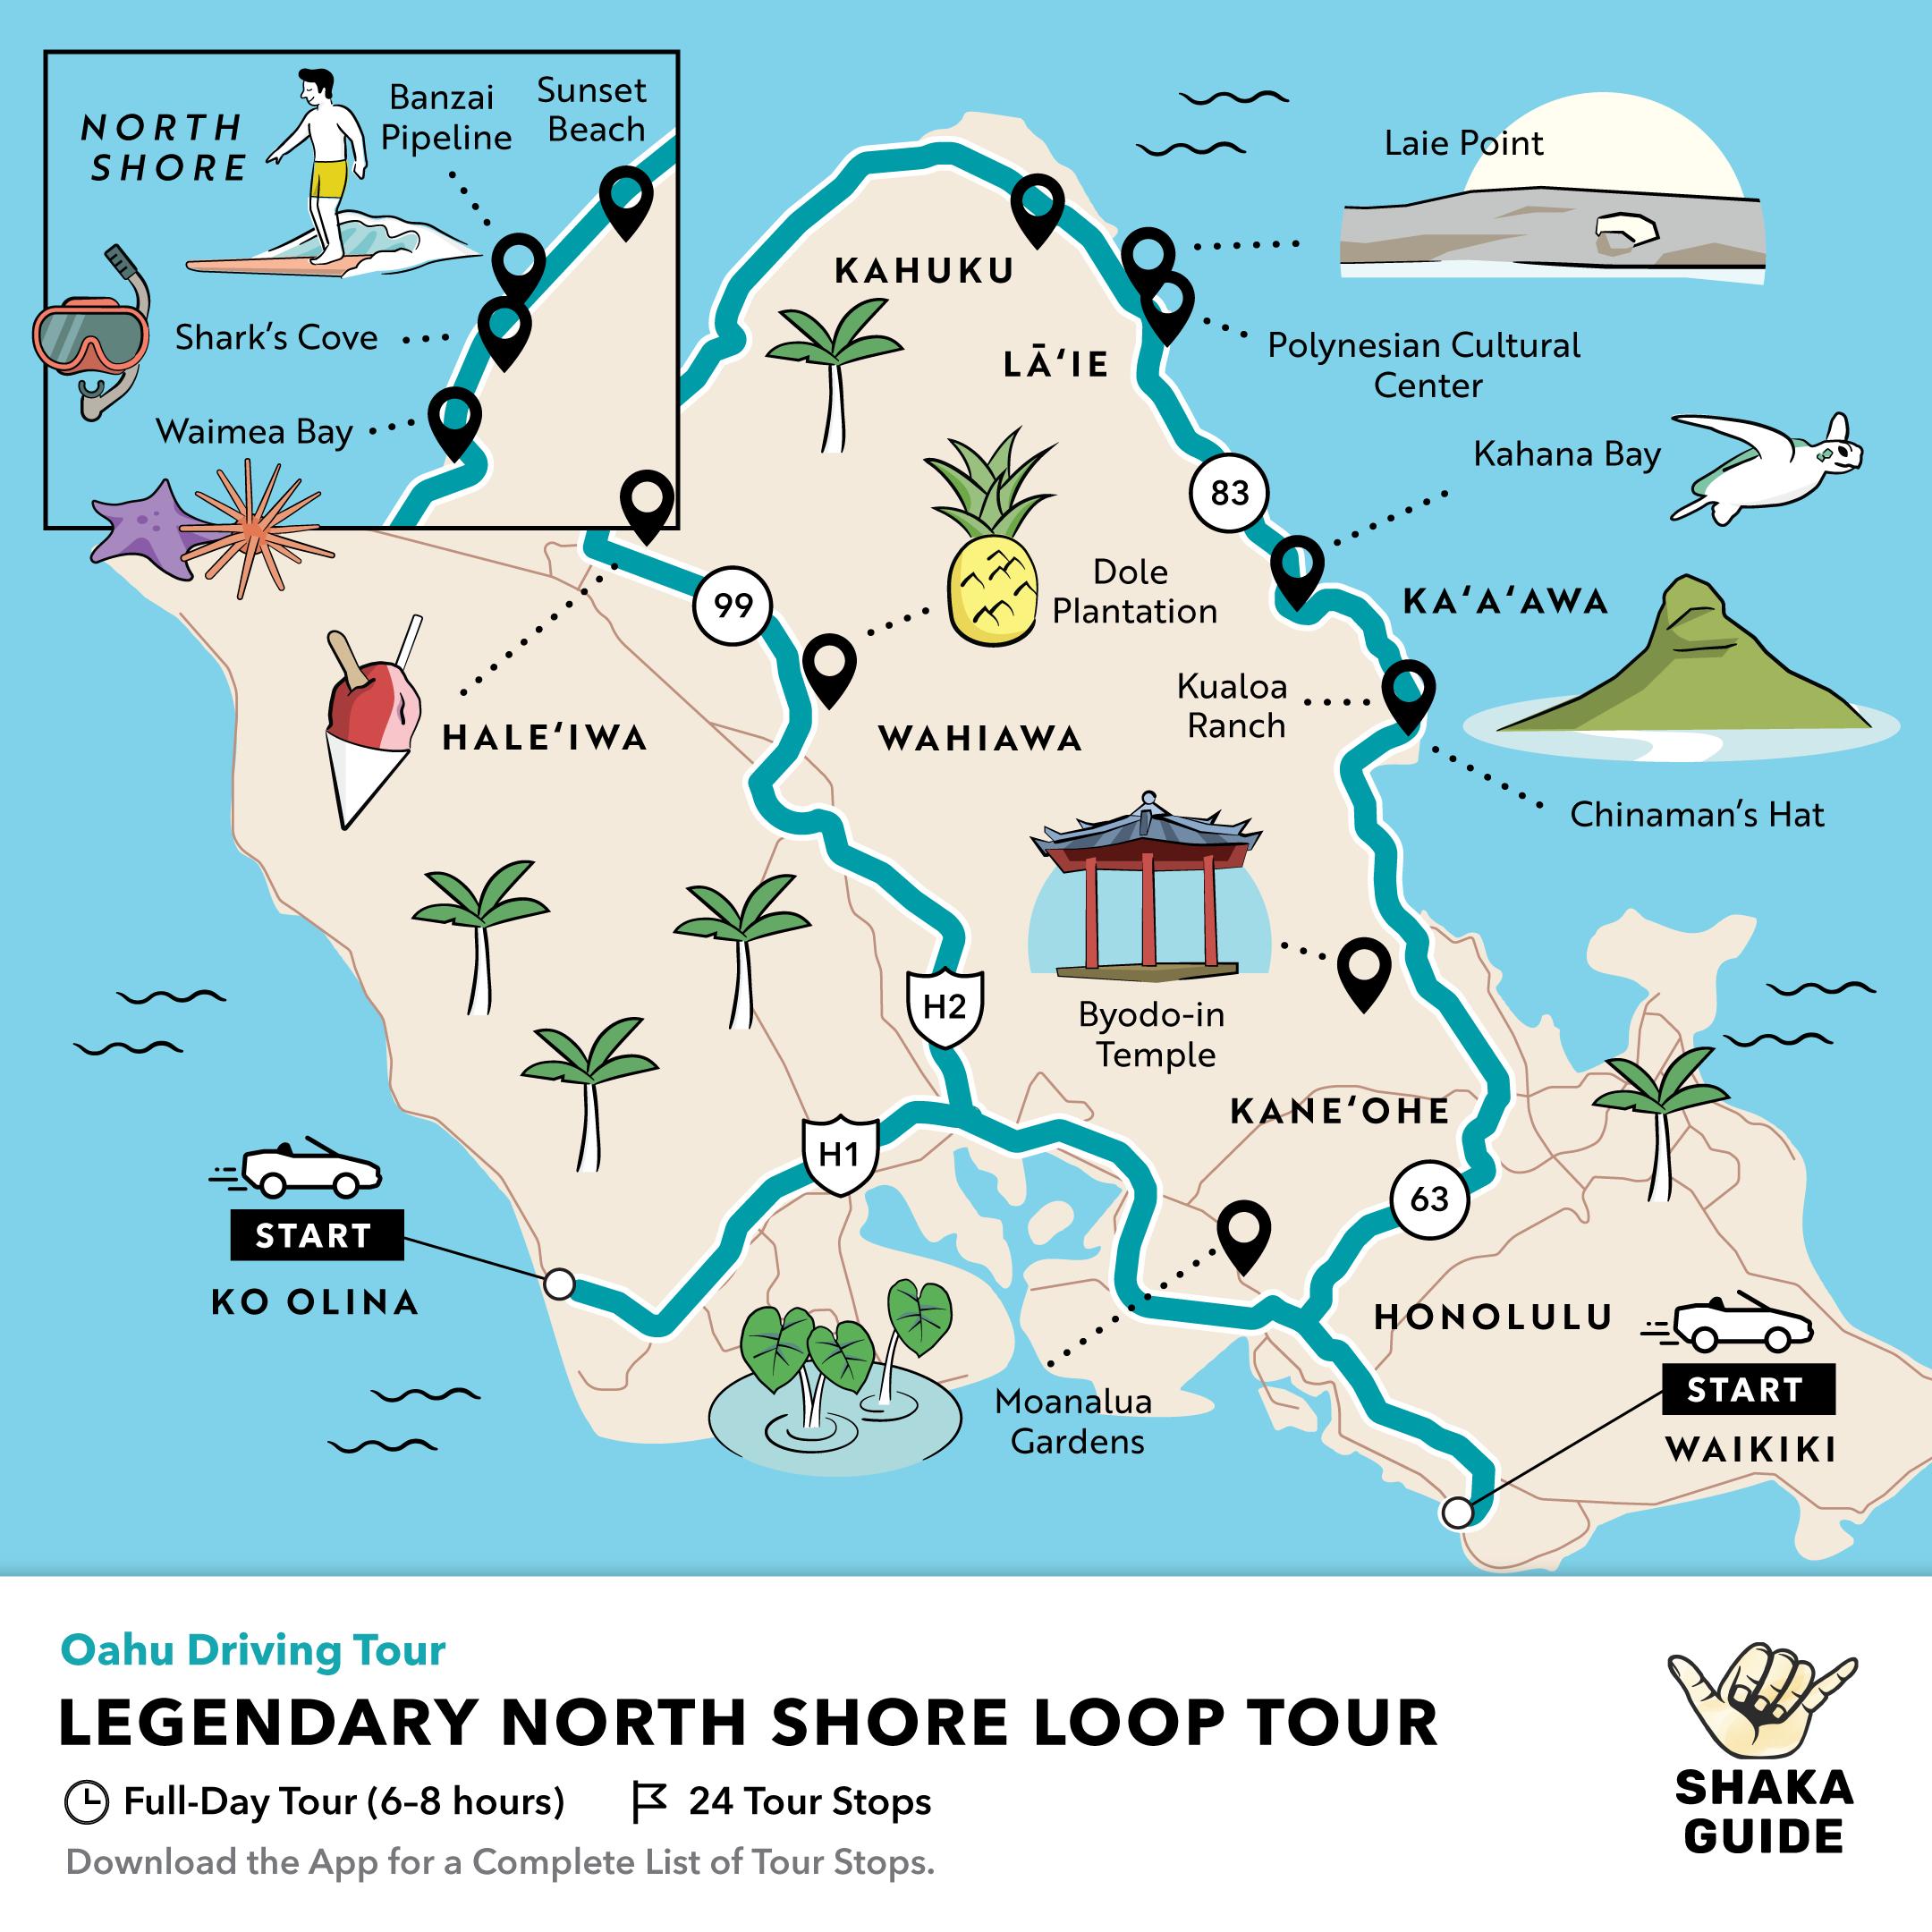 Shaka Guide's Legendary North Shore Loop